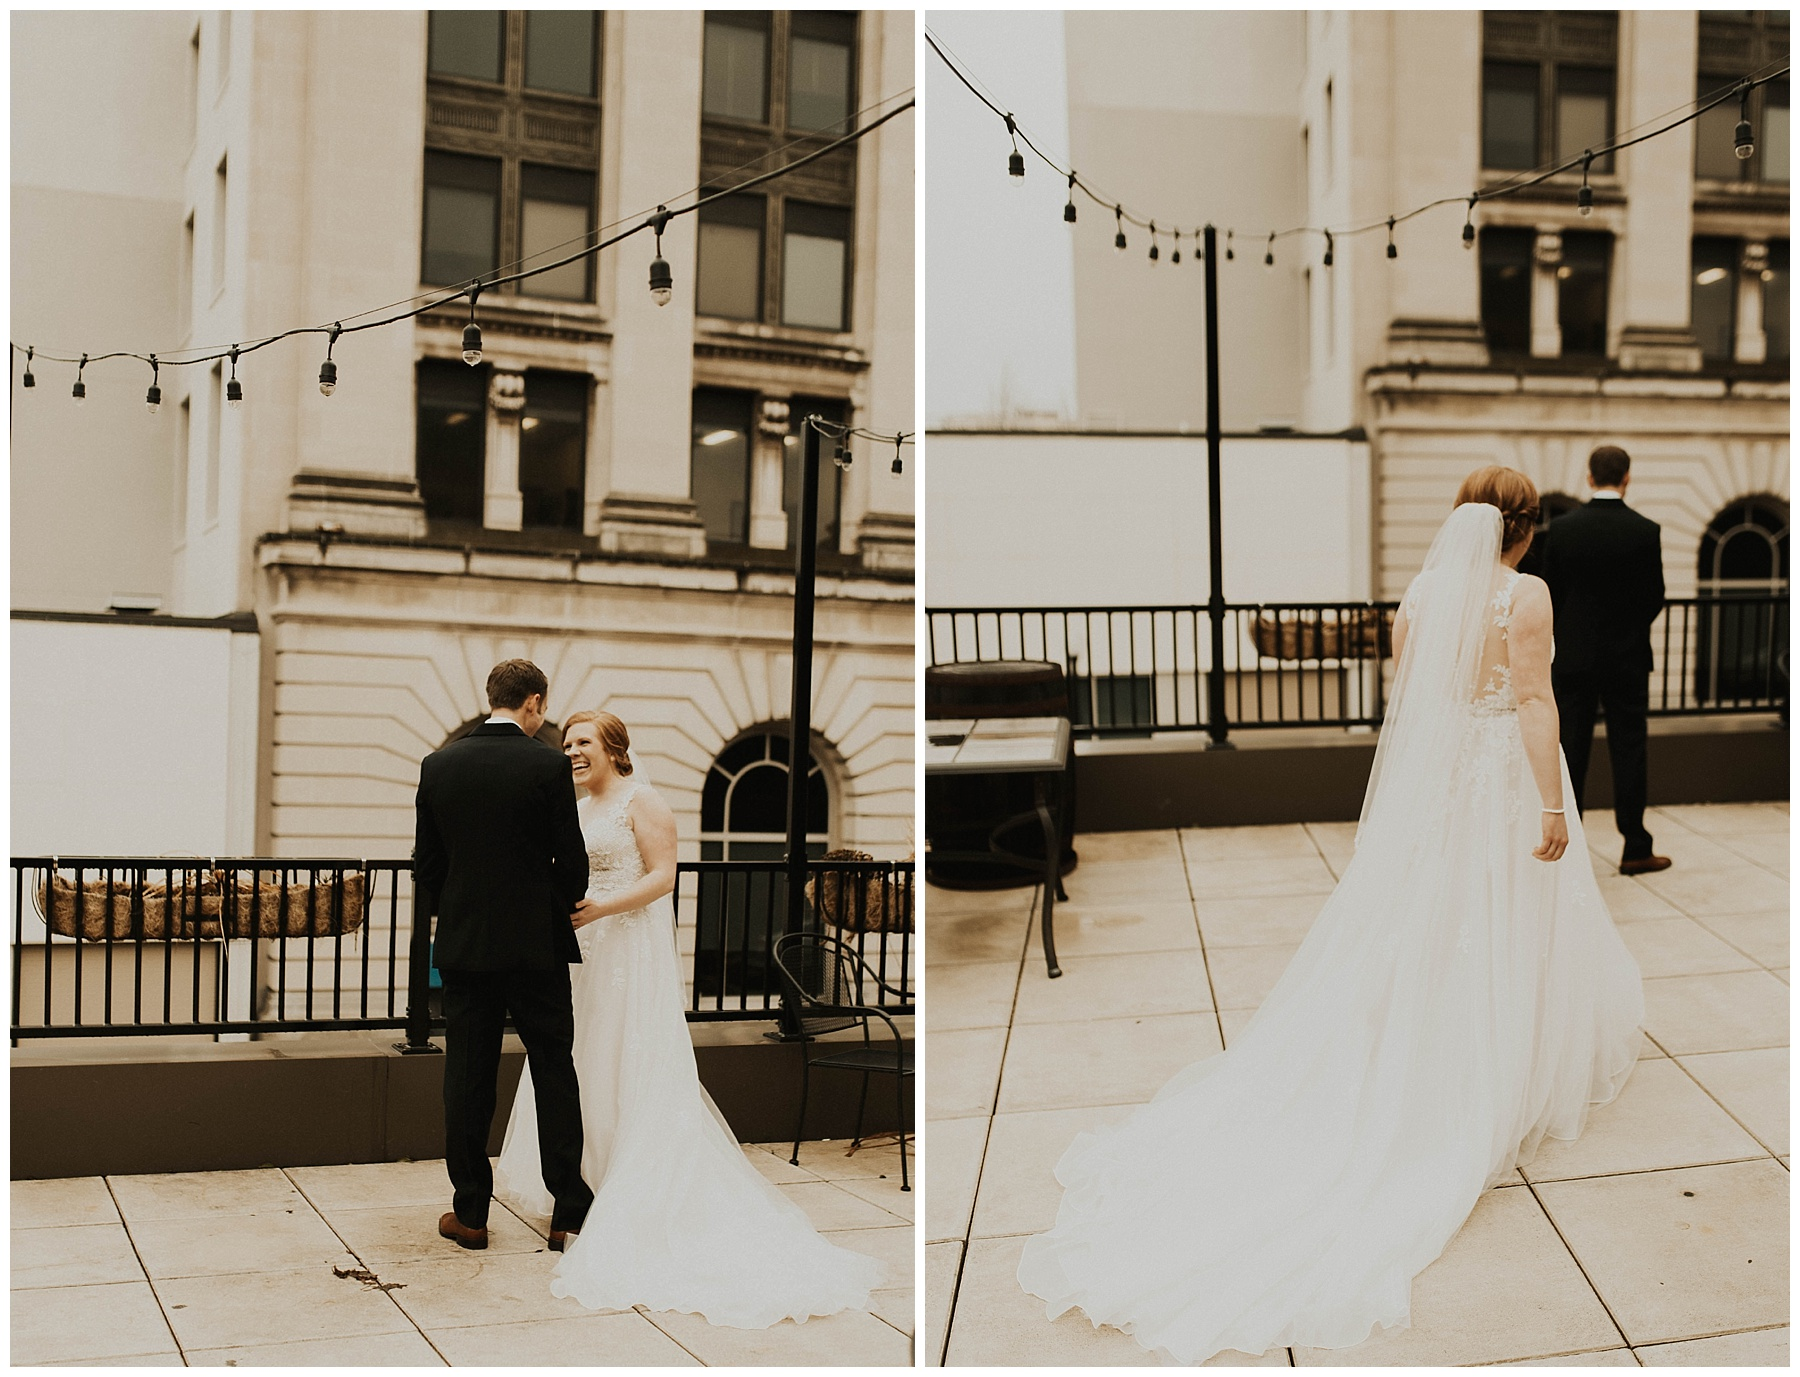 Winter JohnnyEliza Classic Lauren Wedding F otography WBoQrdCxeE